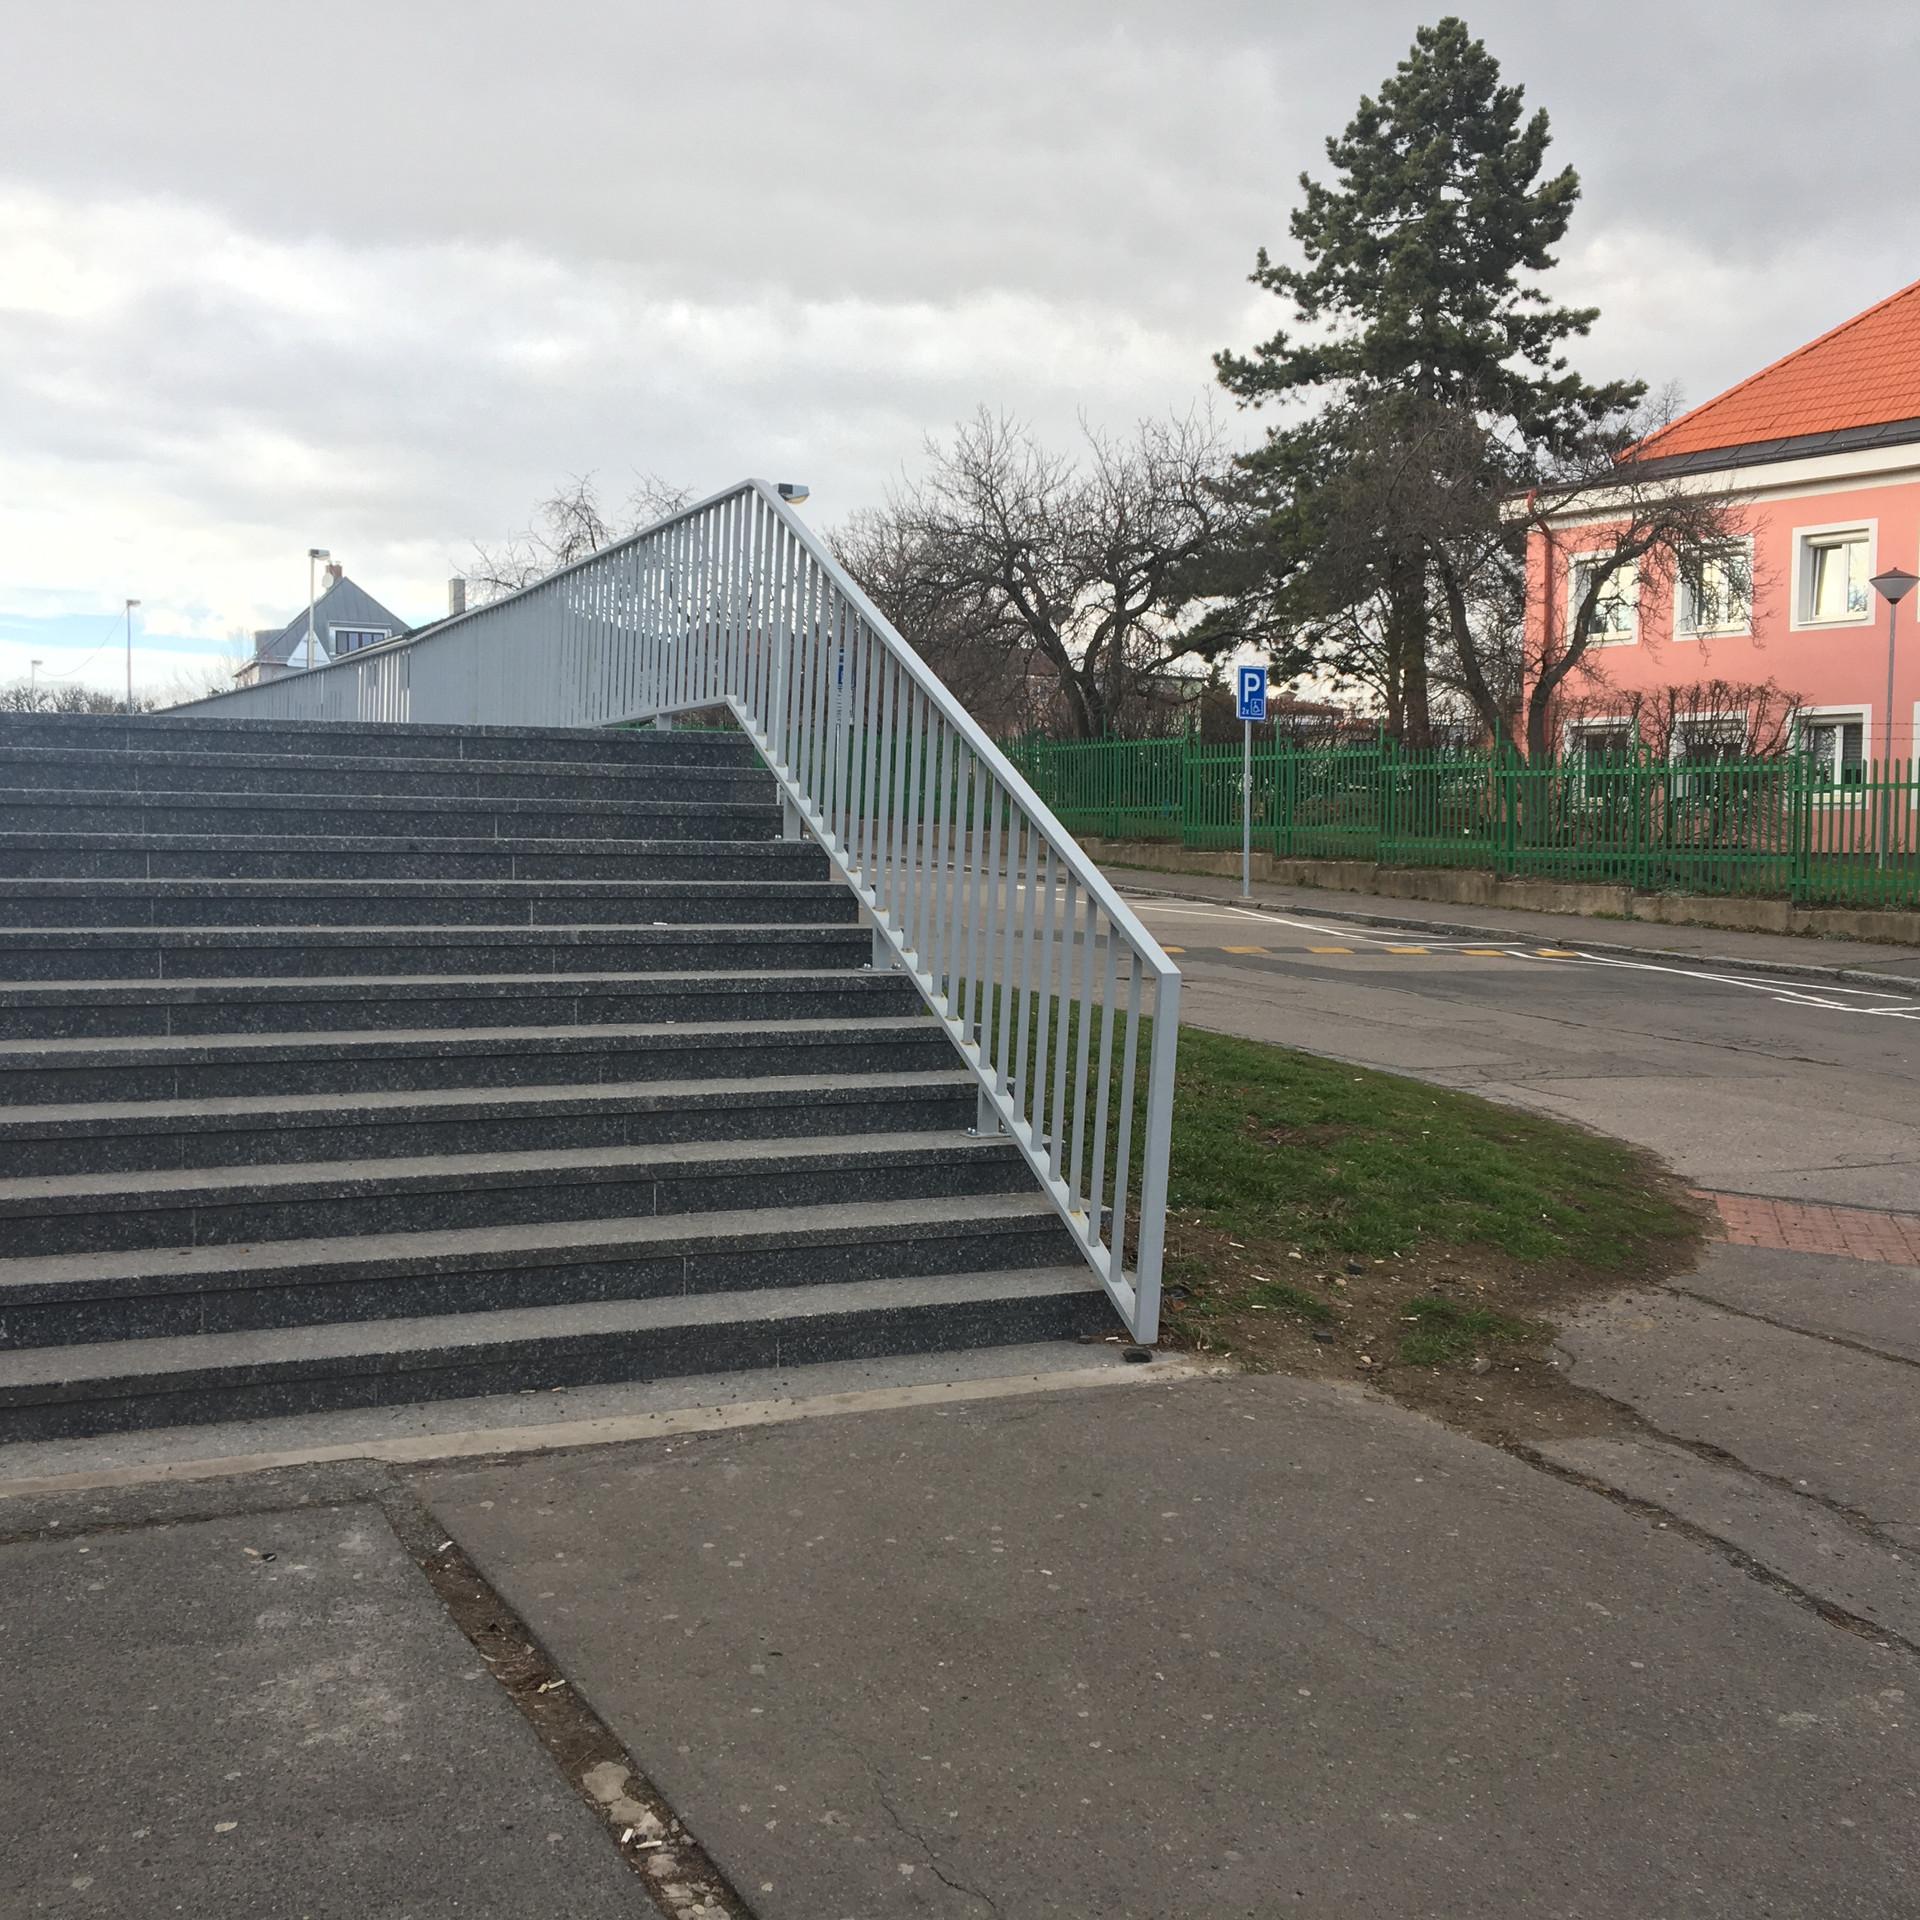 Rail 12 stairs